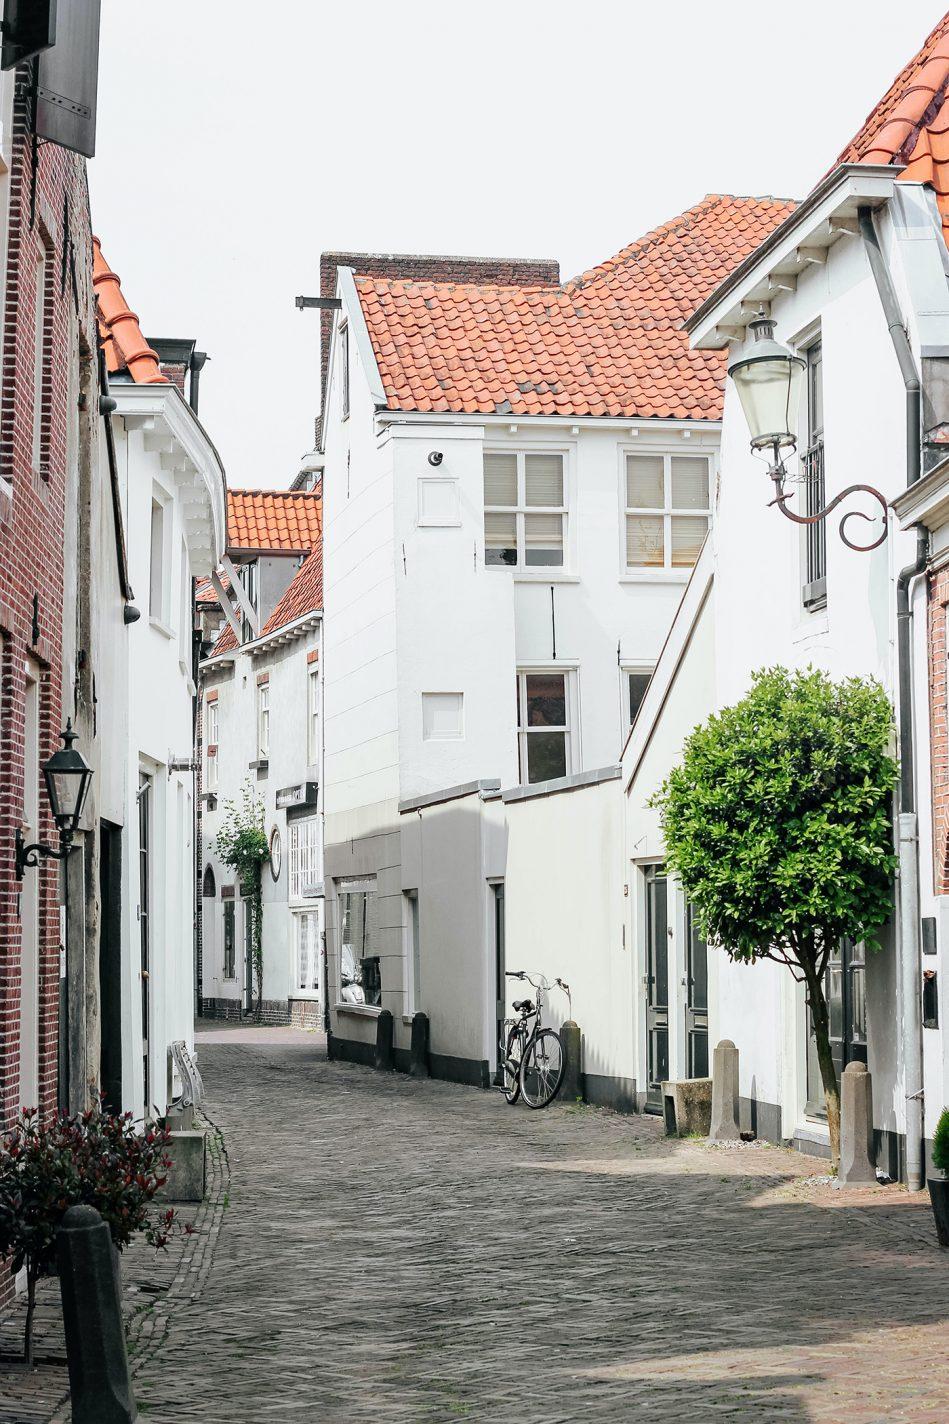 Pittoreske steegjes in de binnenstad van Amersfoort